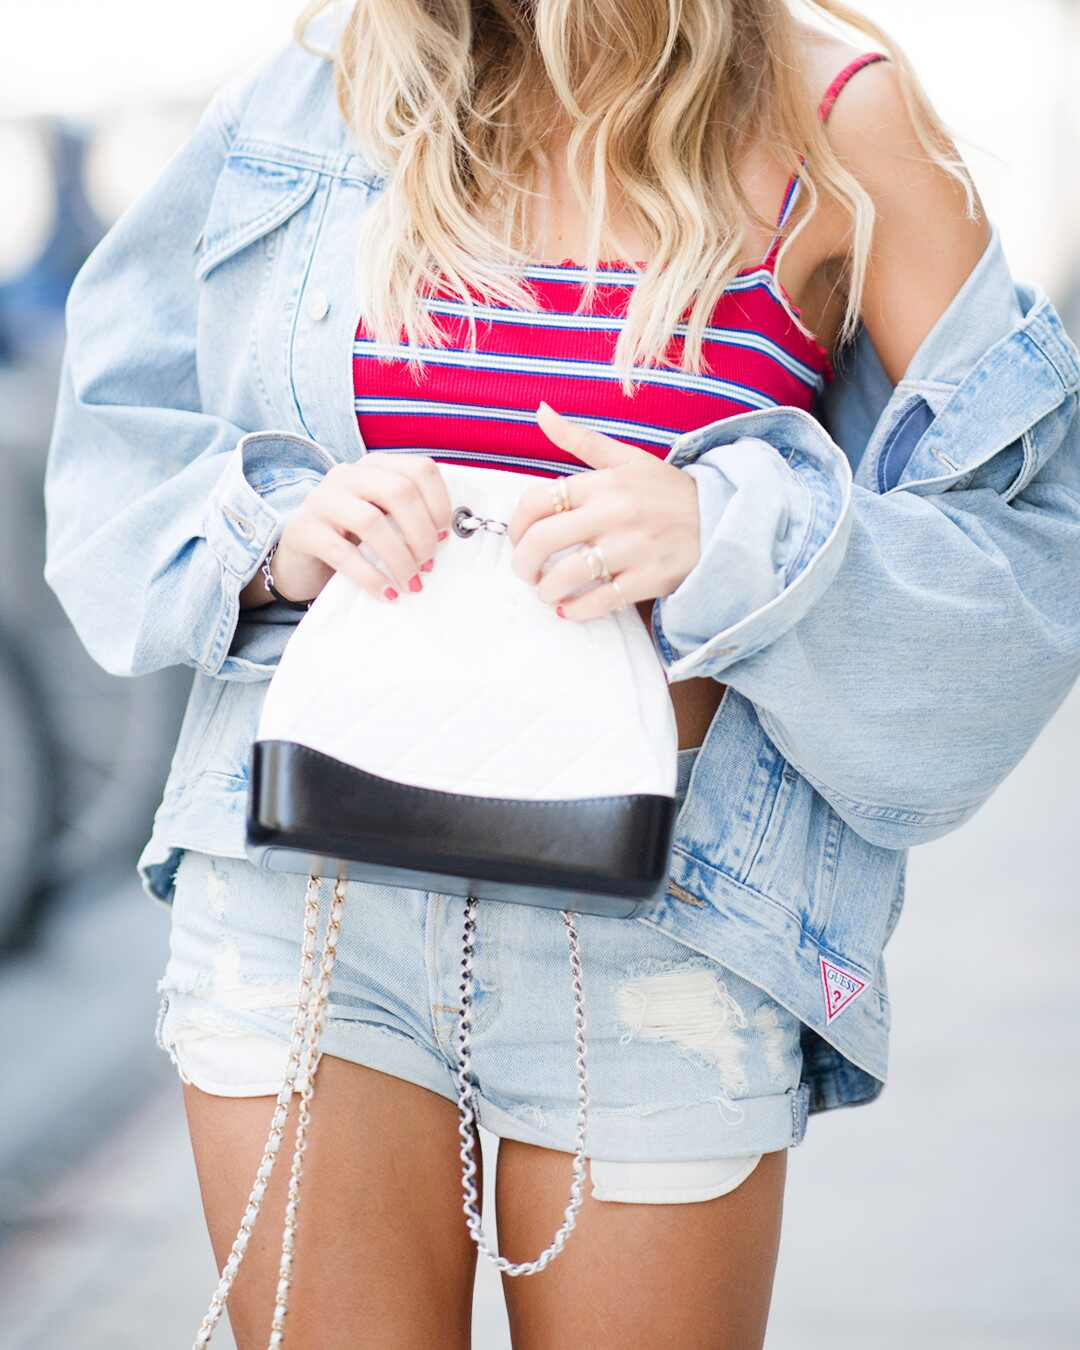 Girls Little Big Kids BF Long Jeans Cotton Denim Bib Overalls Dark Blue Long 140 18July08-21